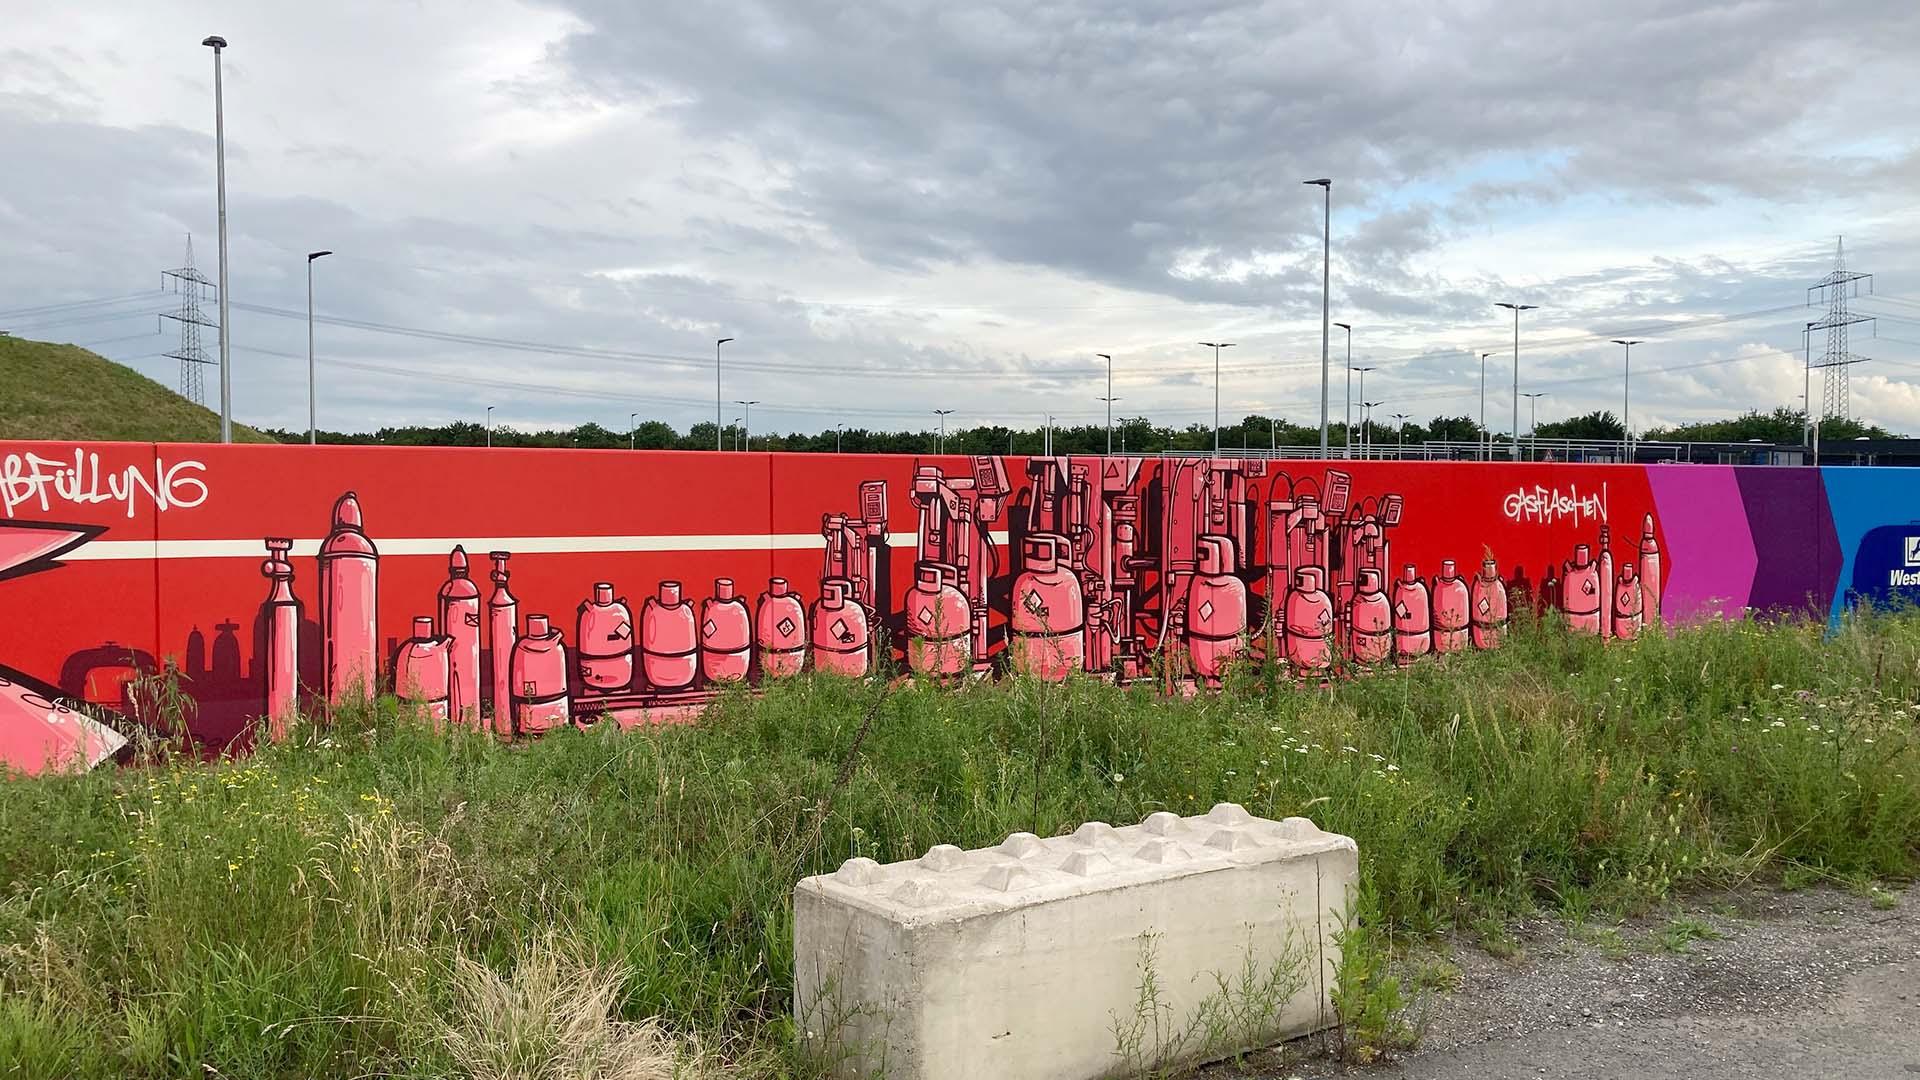 Graffiti, Caratgas, Unternehmen, Firma, Krefeld, Gaswerk